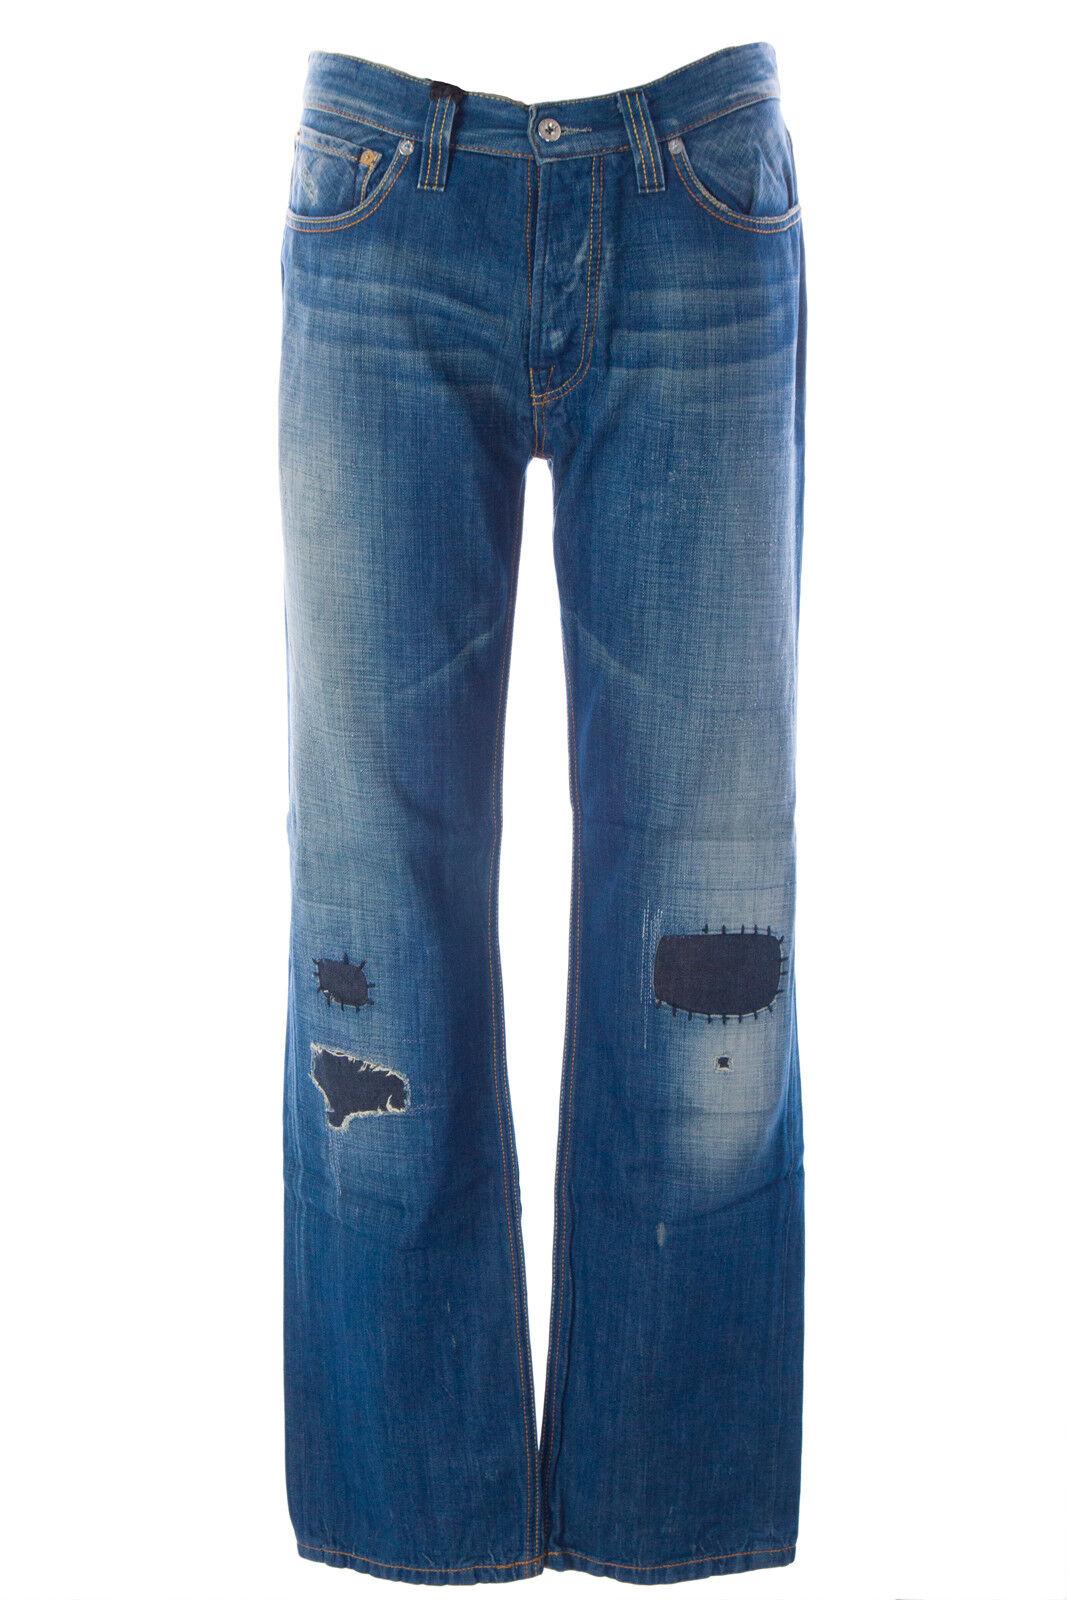 blueE BLOOD Men's Form LH Denim Button Fly Jeans MFOFS0753 NWT